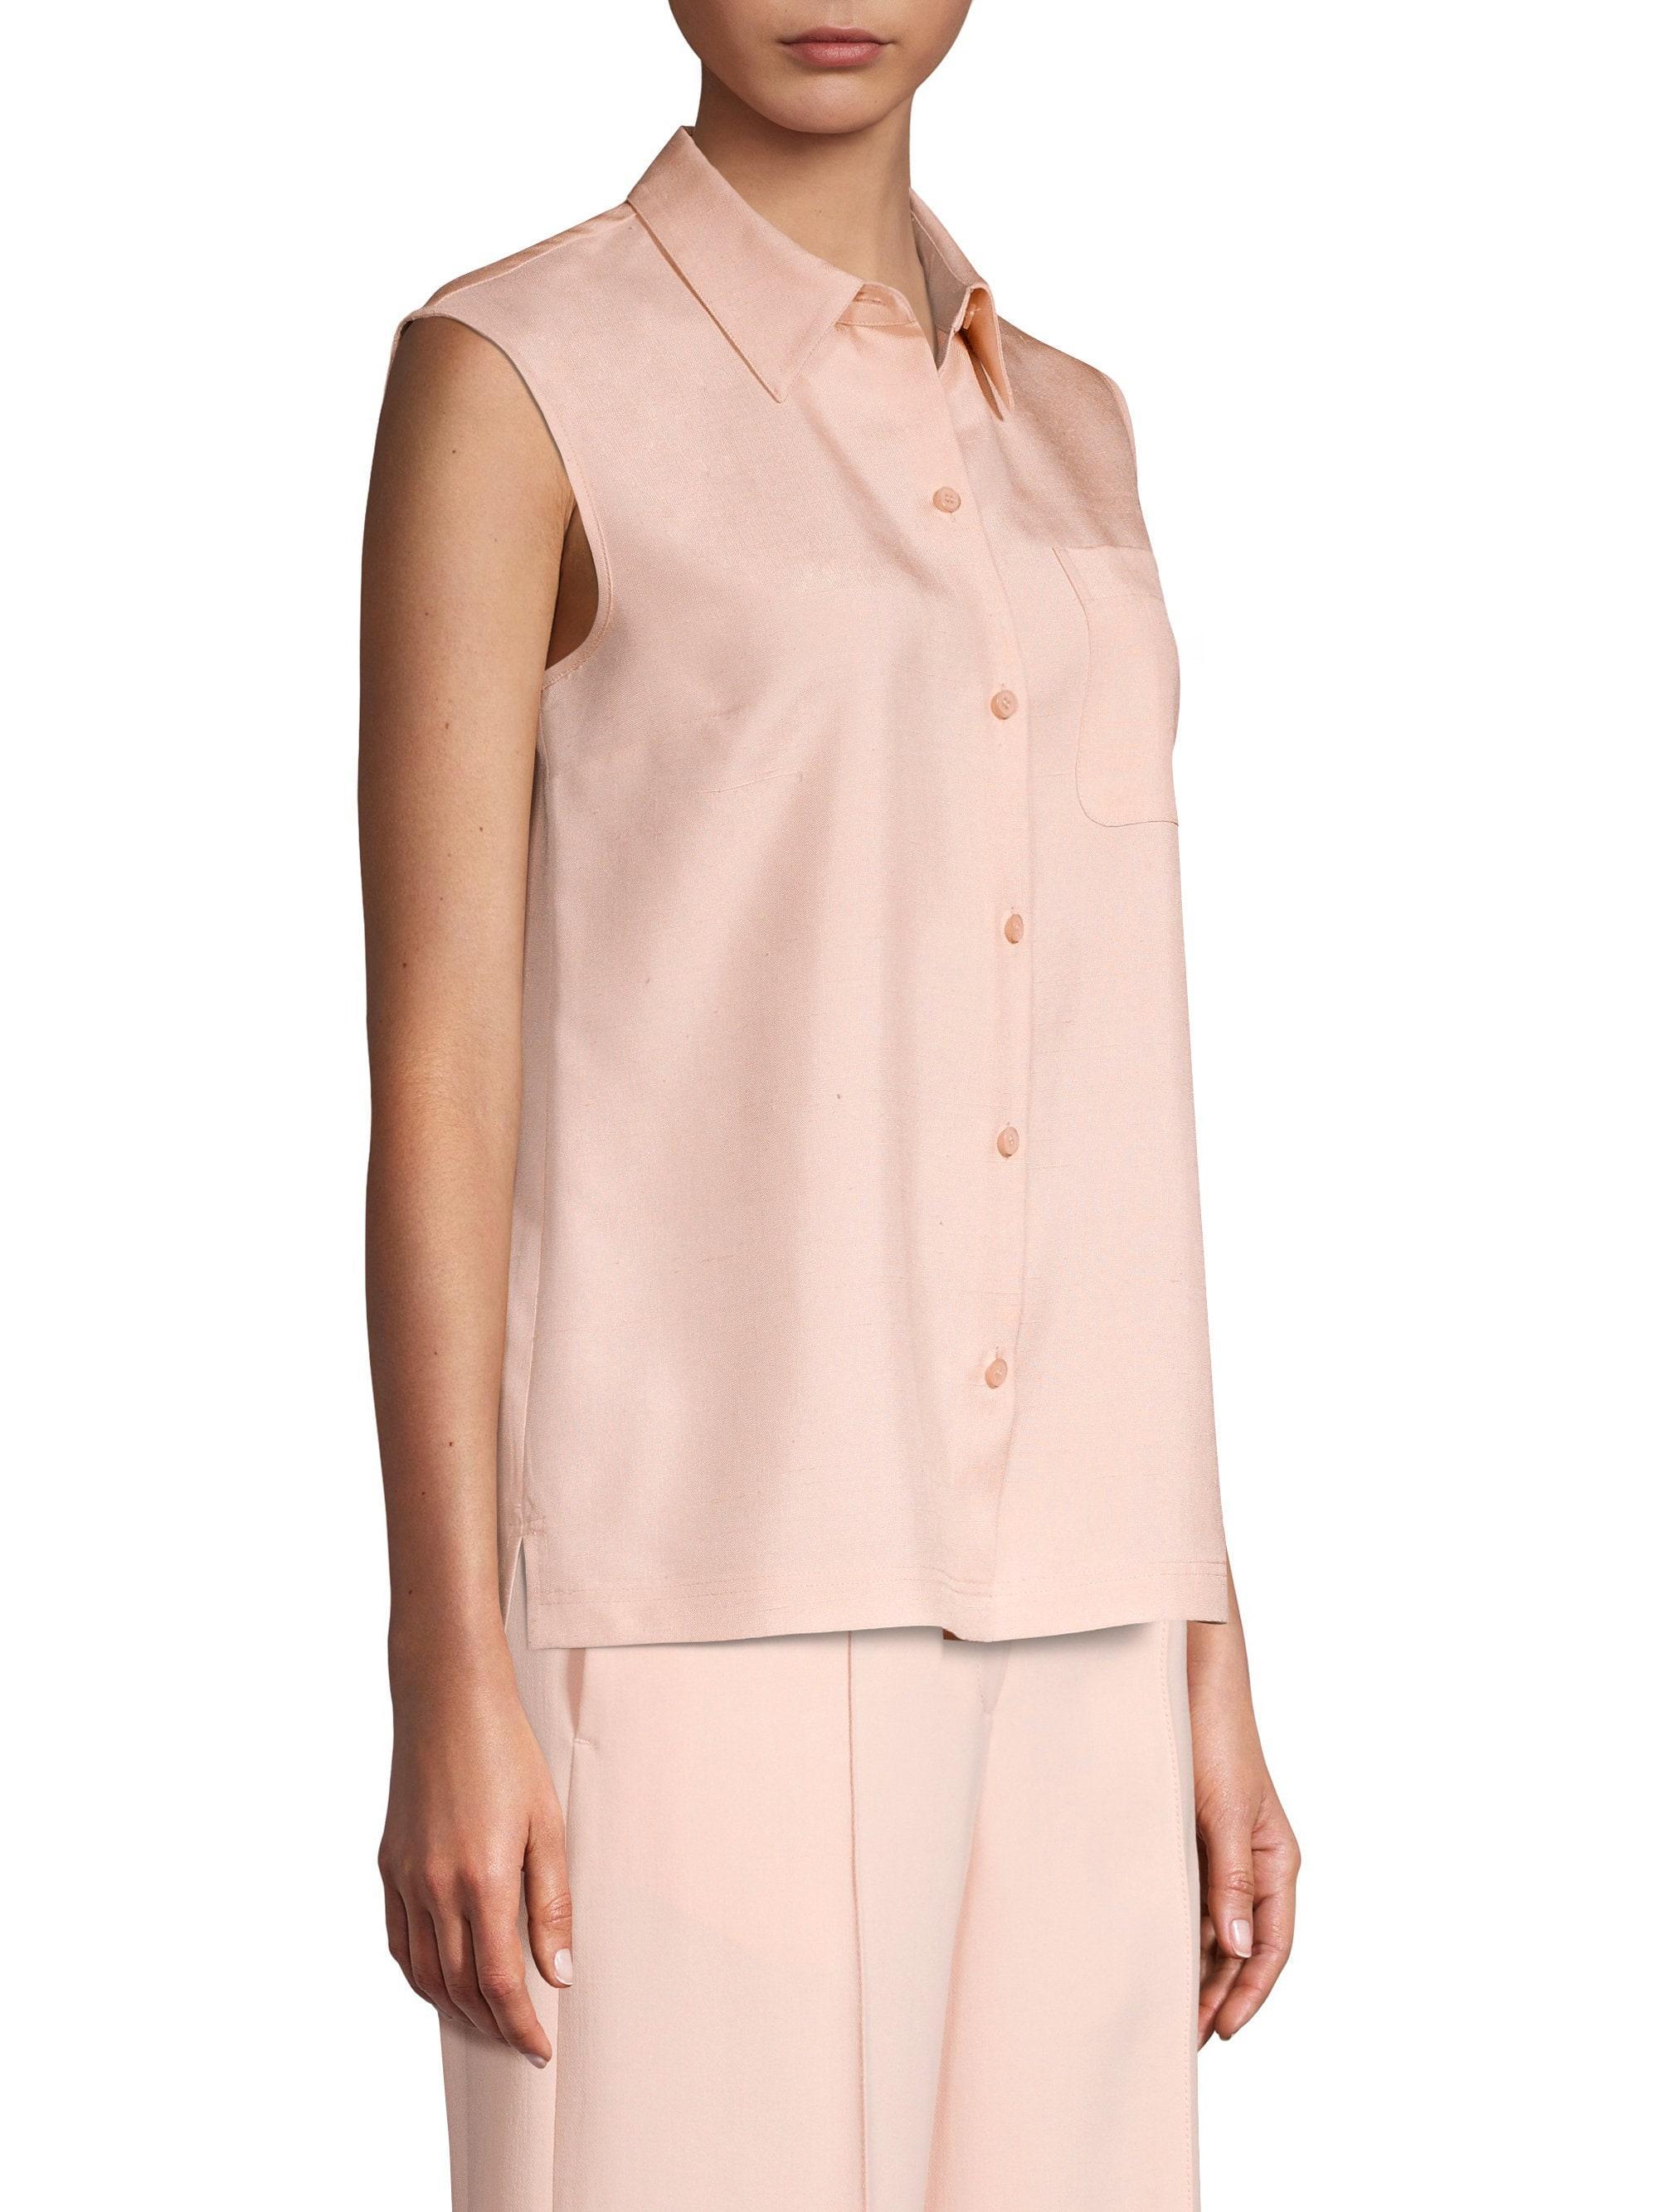 8014b4ab2538a Lyst - Lafayette 148 New York Women s Yani Sleeveless Silk Blouse -  Macaroon - Size 18 in Pink